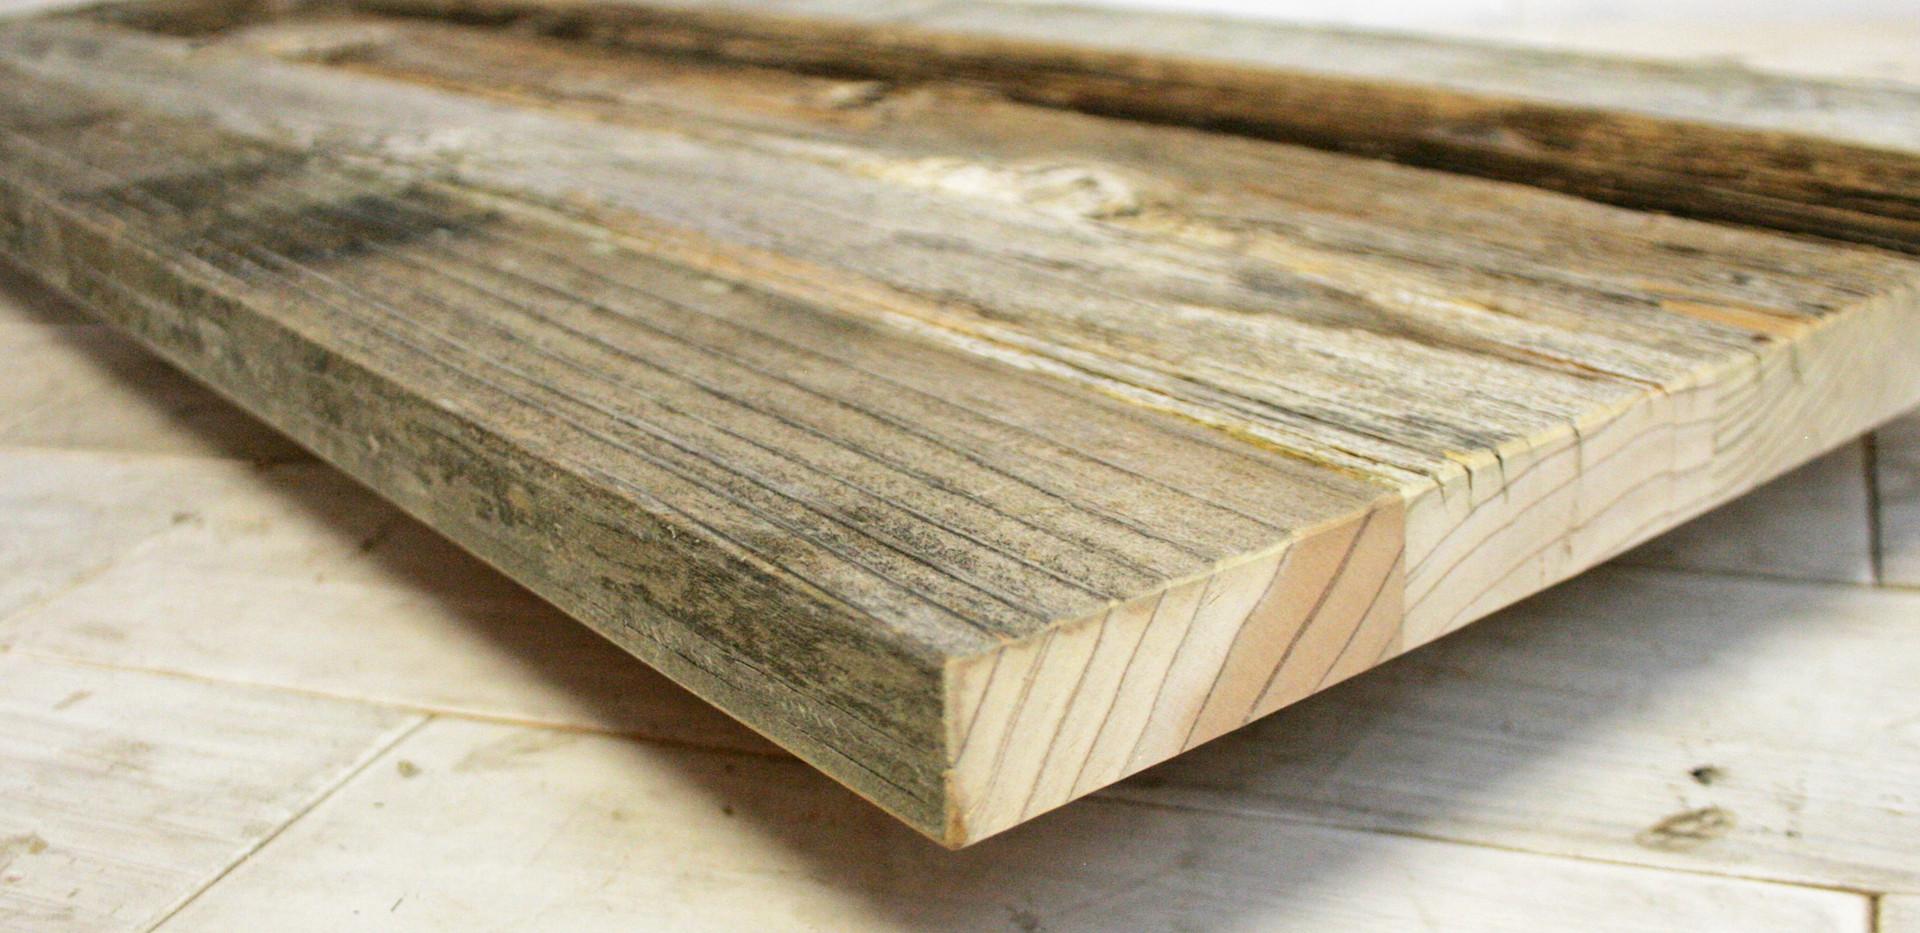 Barn Wood Shelf Unfinished